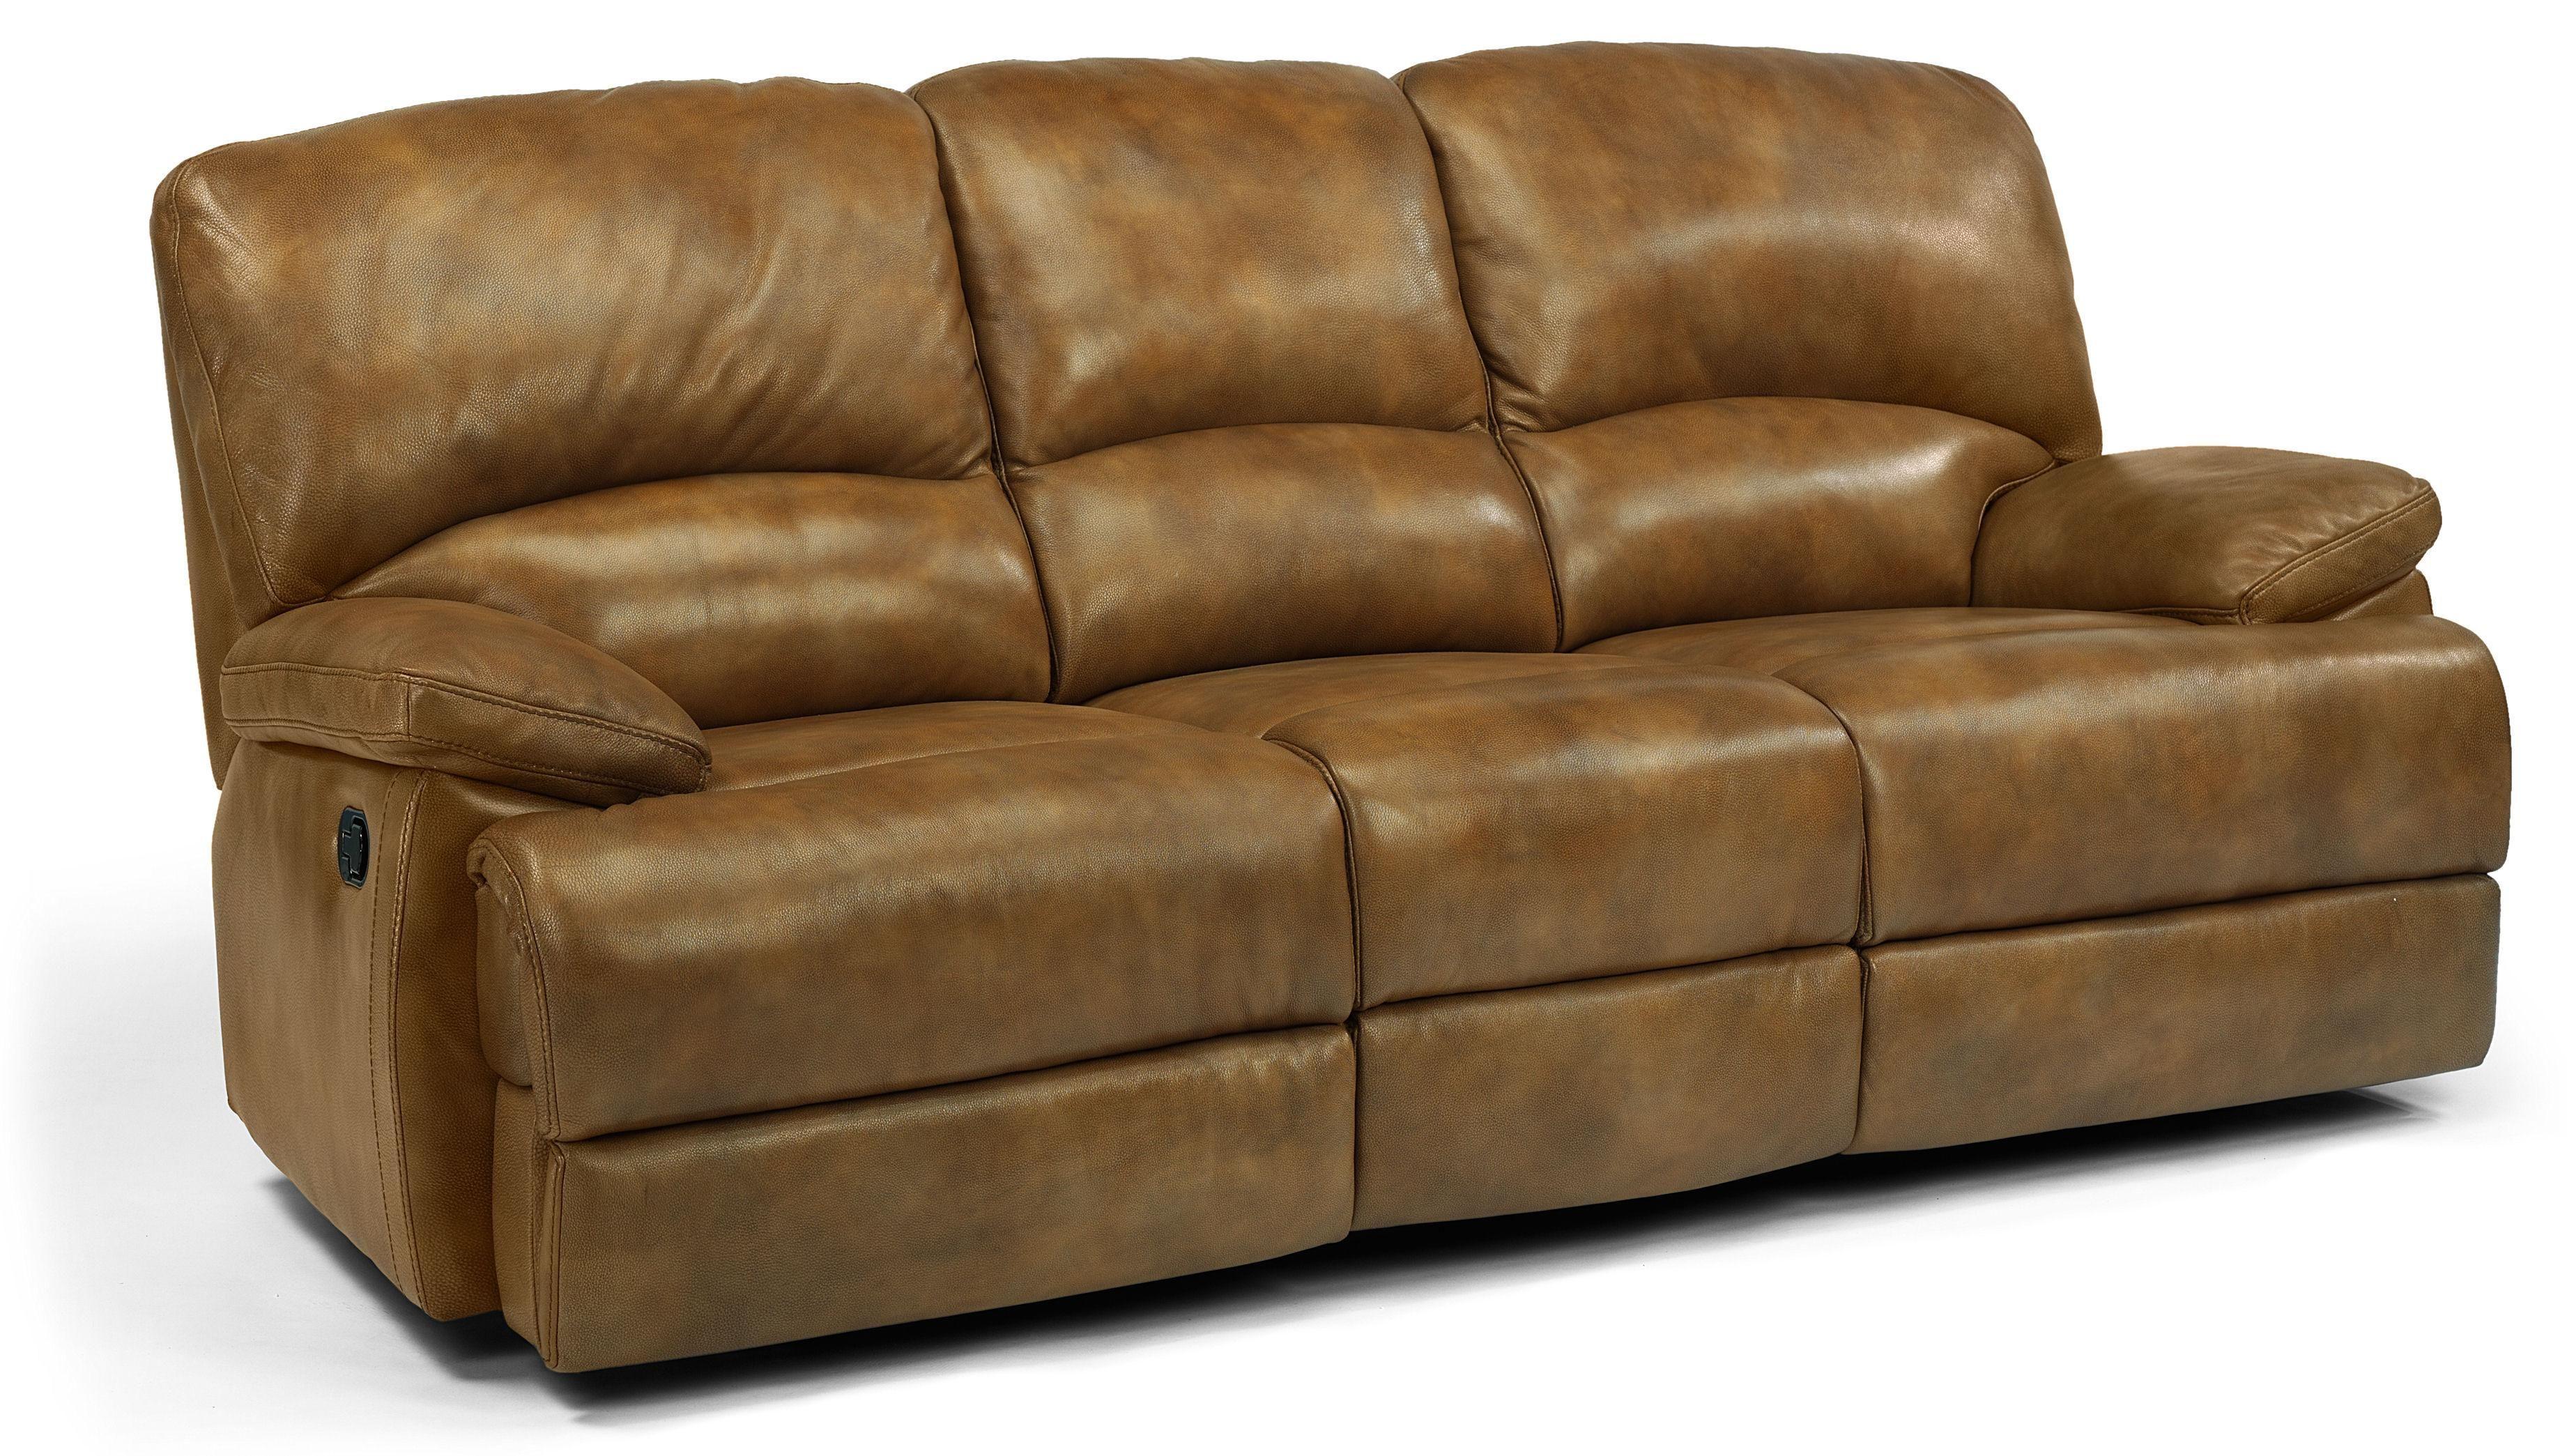 Wondrous Latitudes Dylan Reclining Sofa By Flexsteel Furniture Machost Co Dining Chair Design Ideas Machostcouk